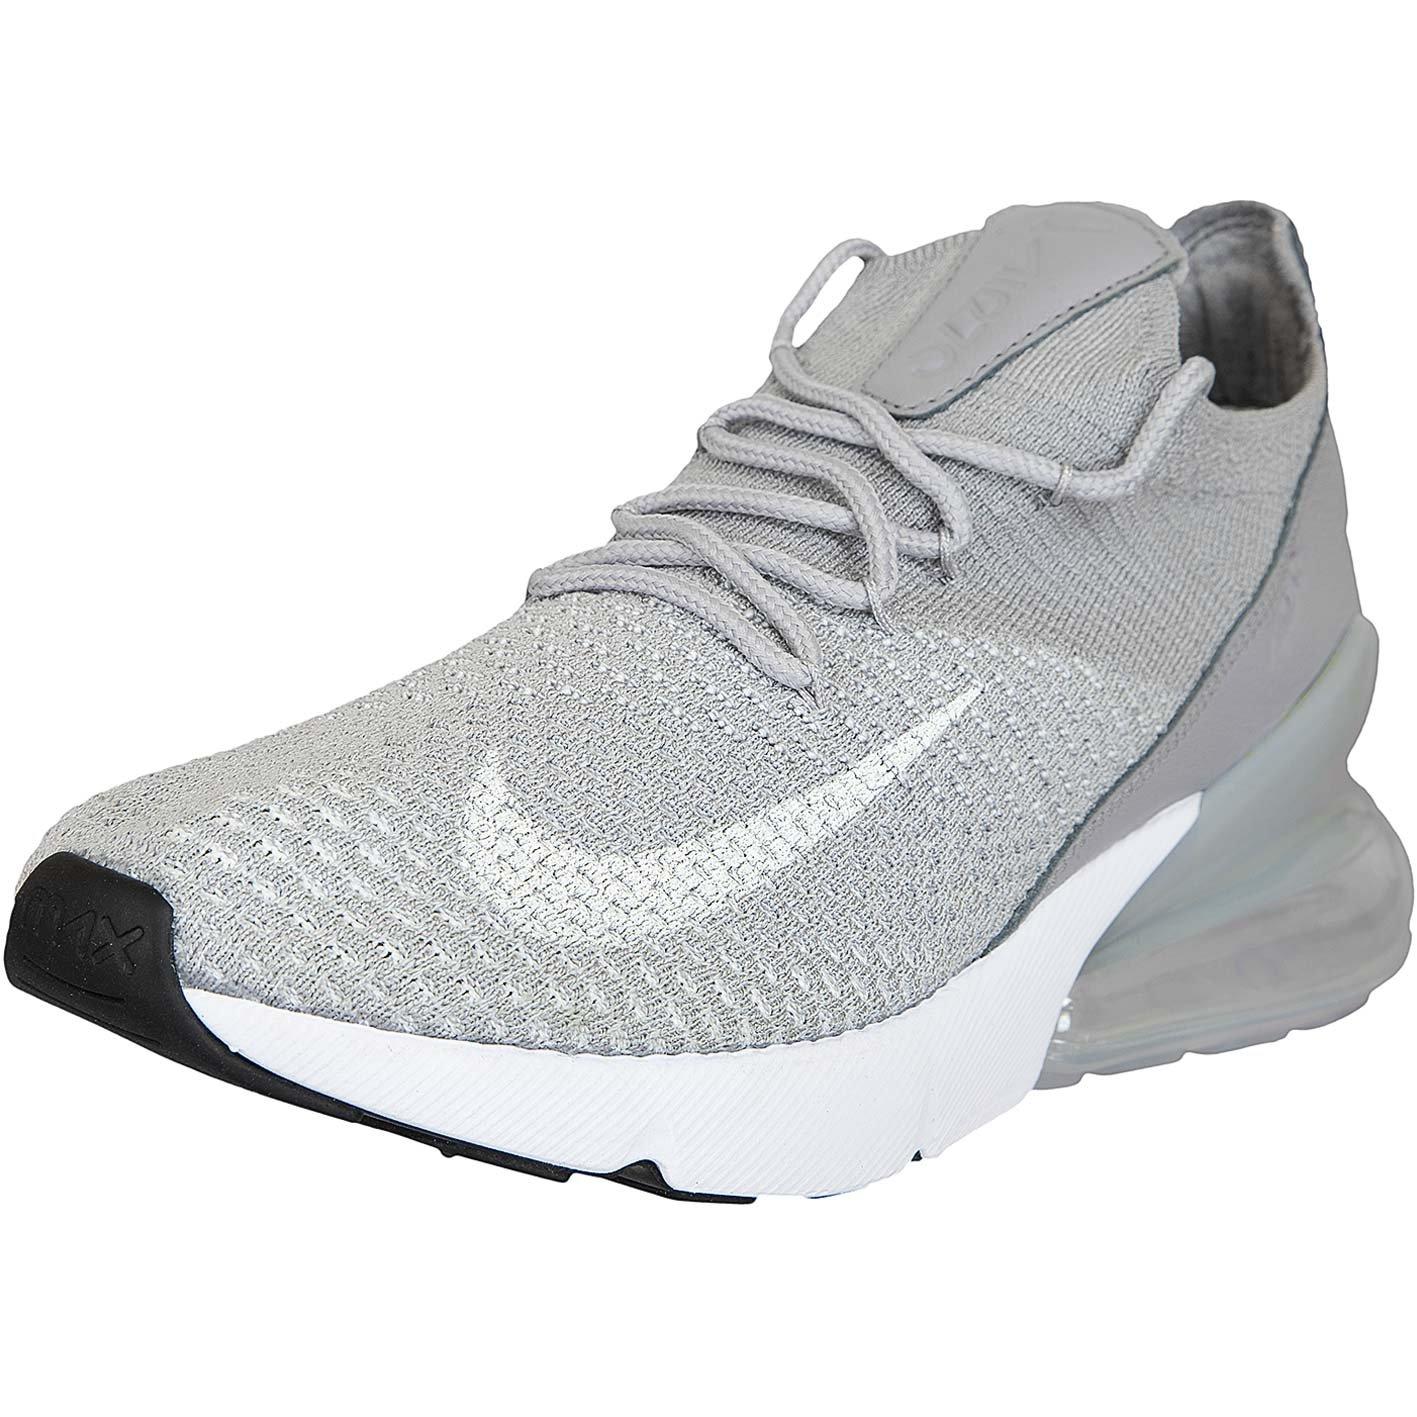 NIKE Air Court Mo IV 431847102, Chaussures de sport femme AH6803-001